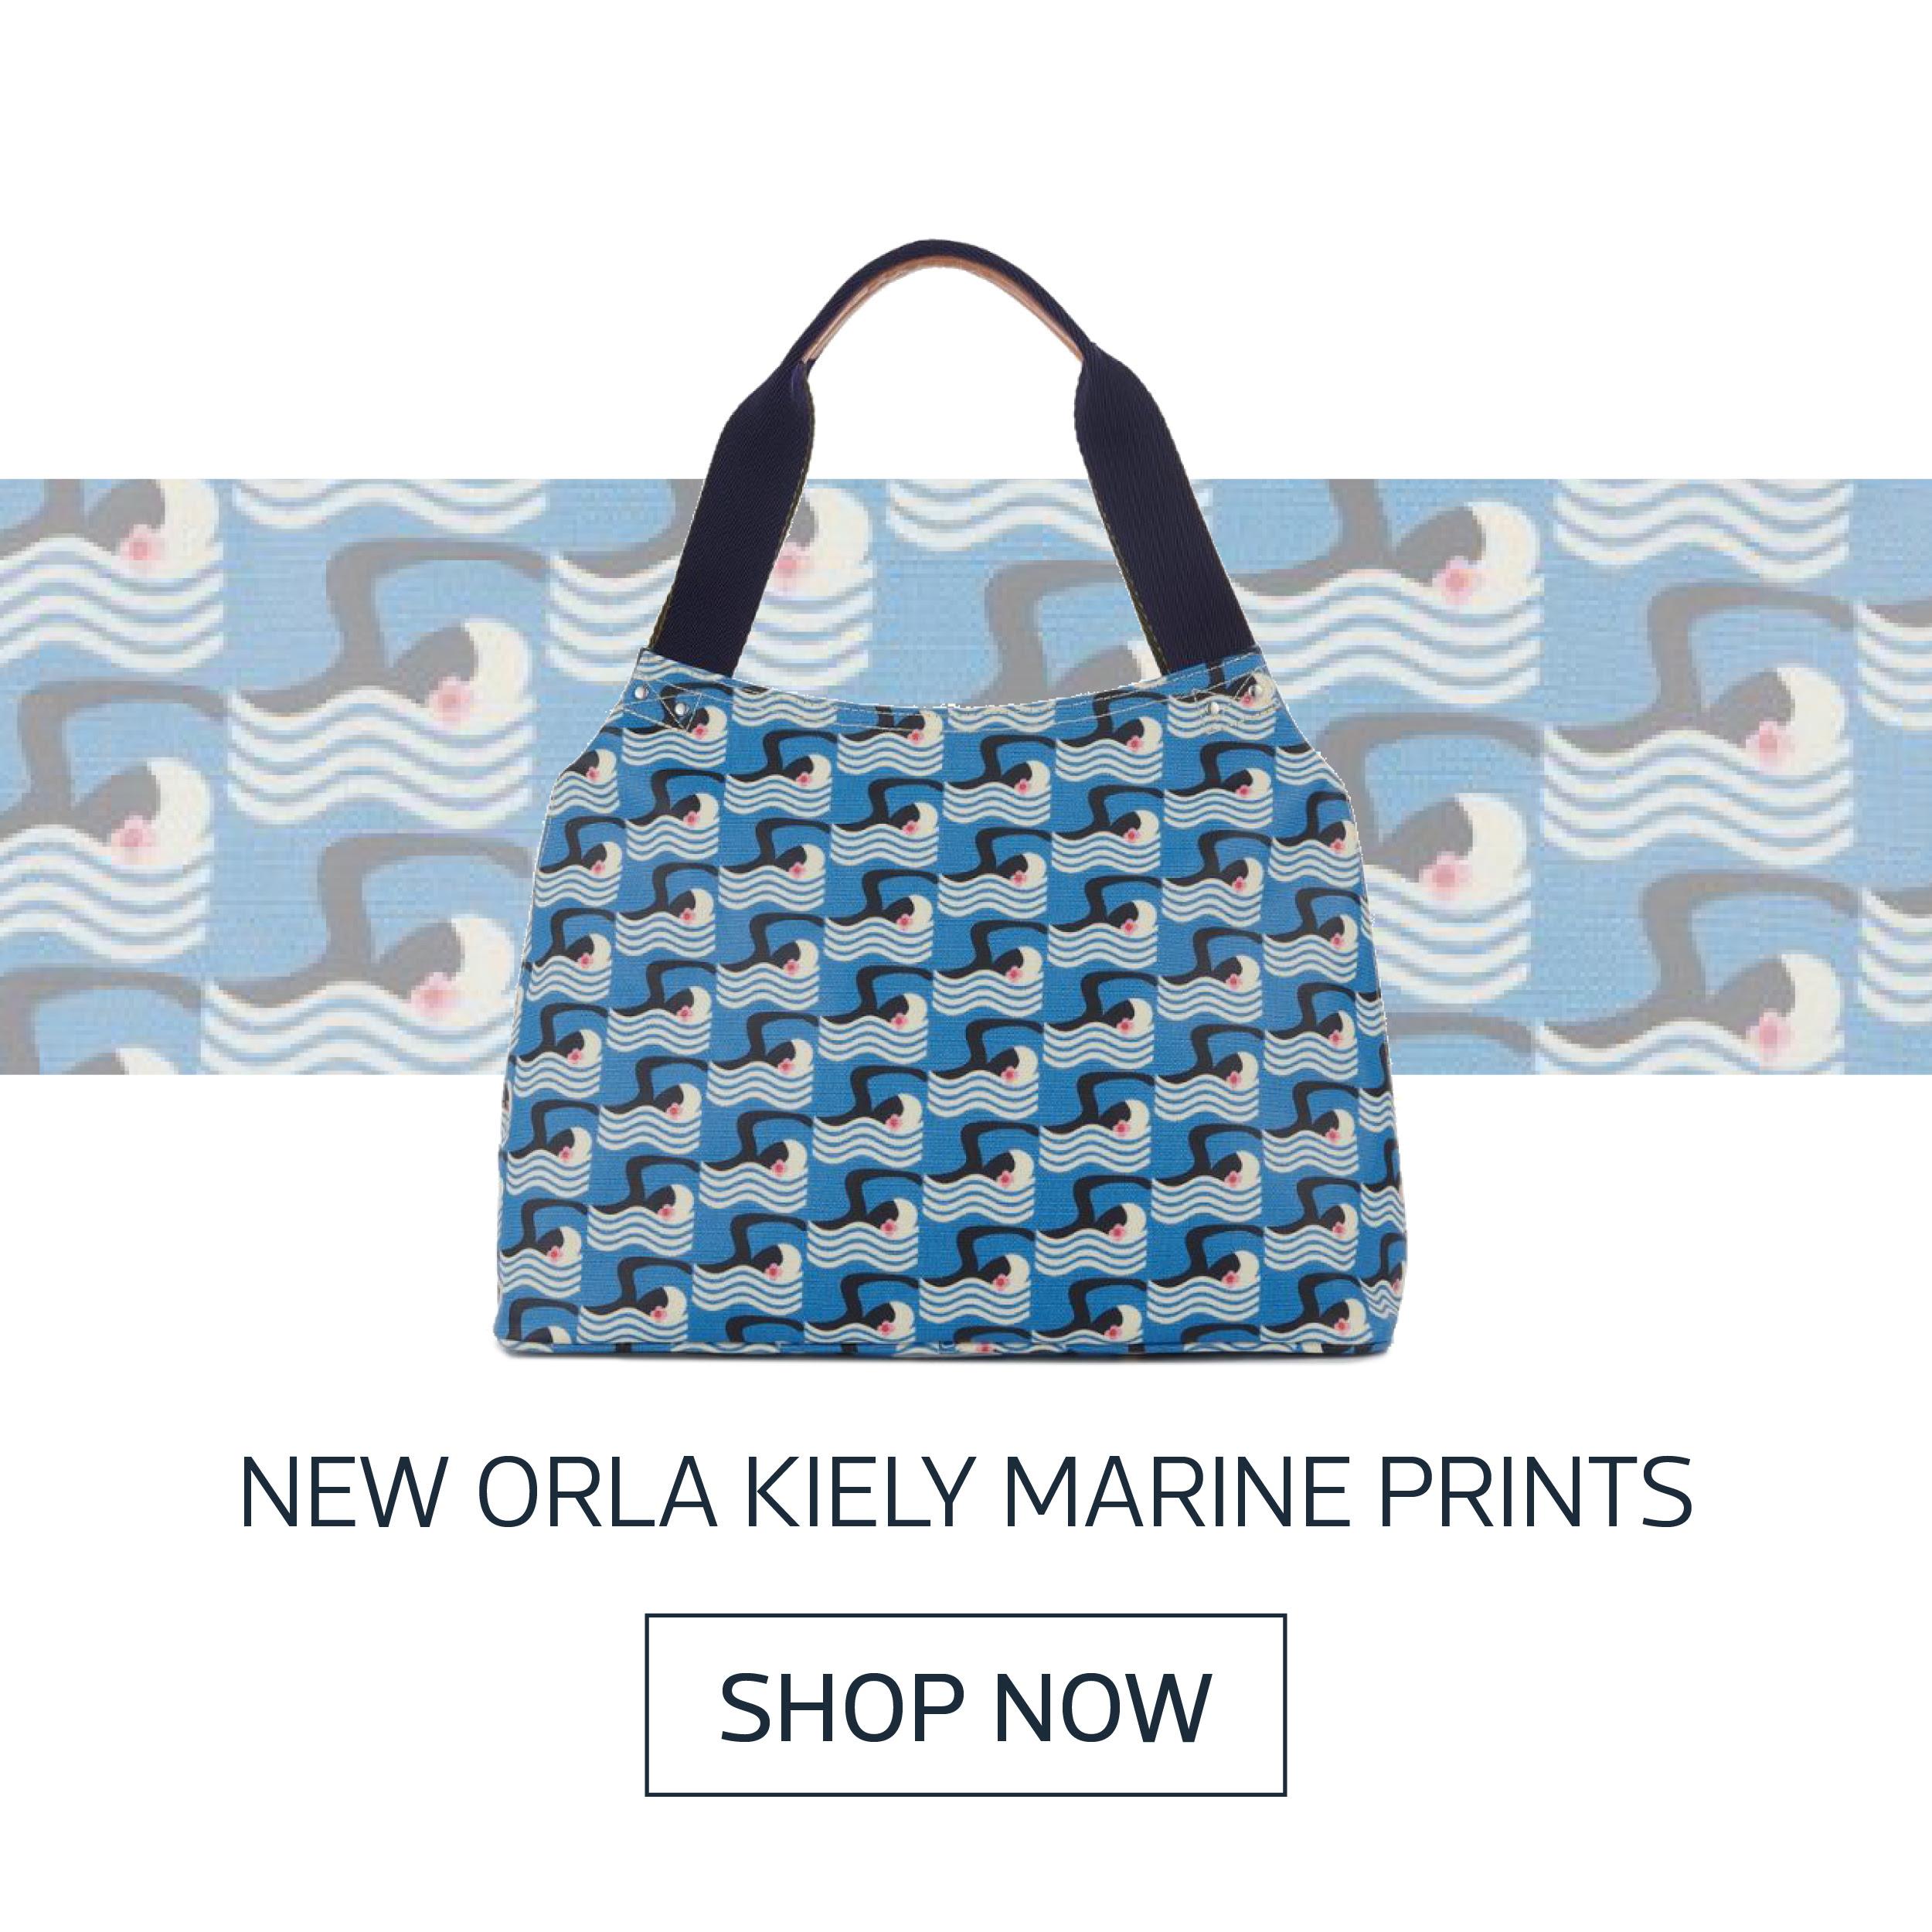 New orla kiely Marine prints